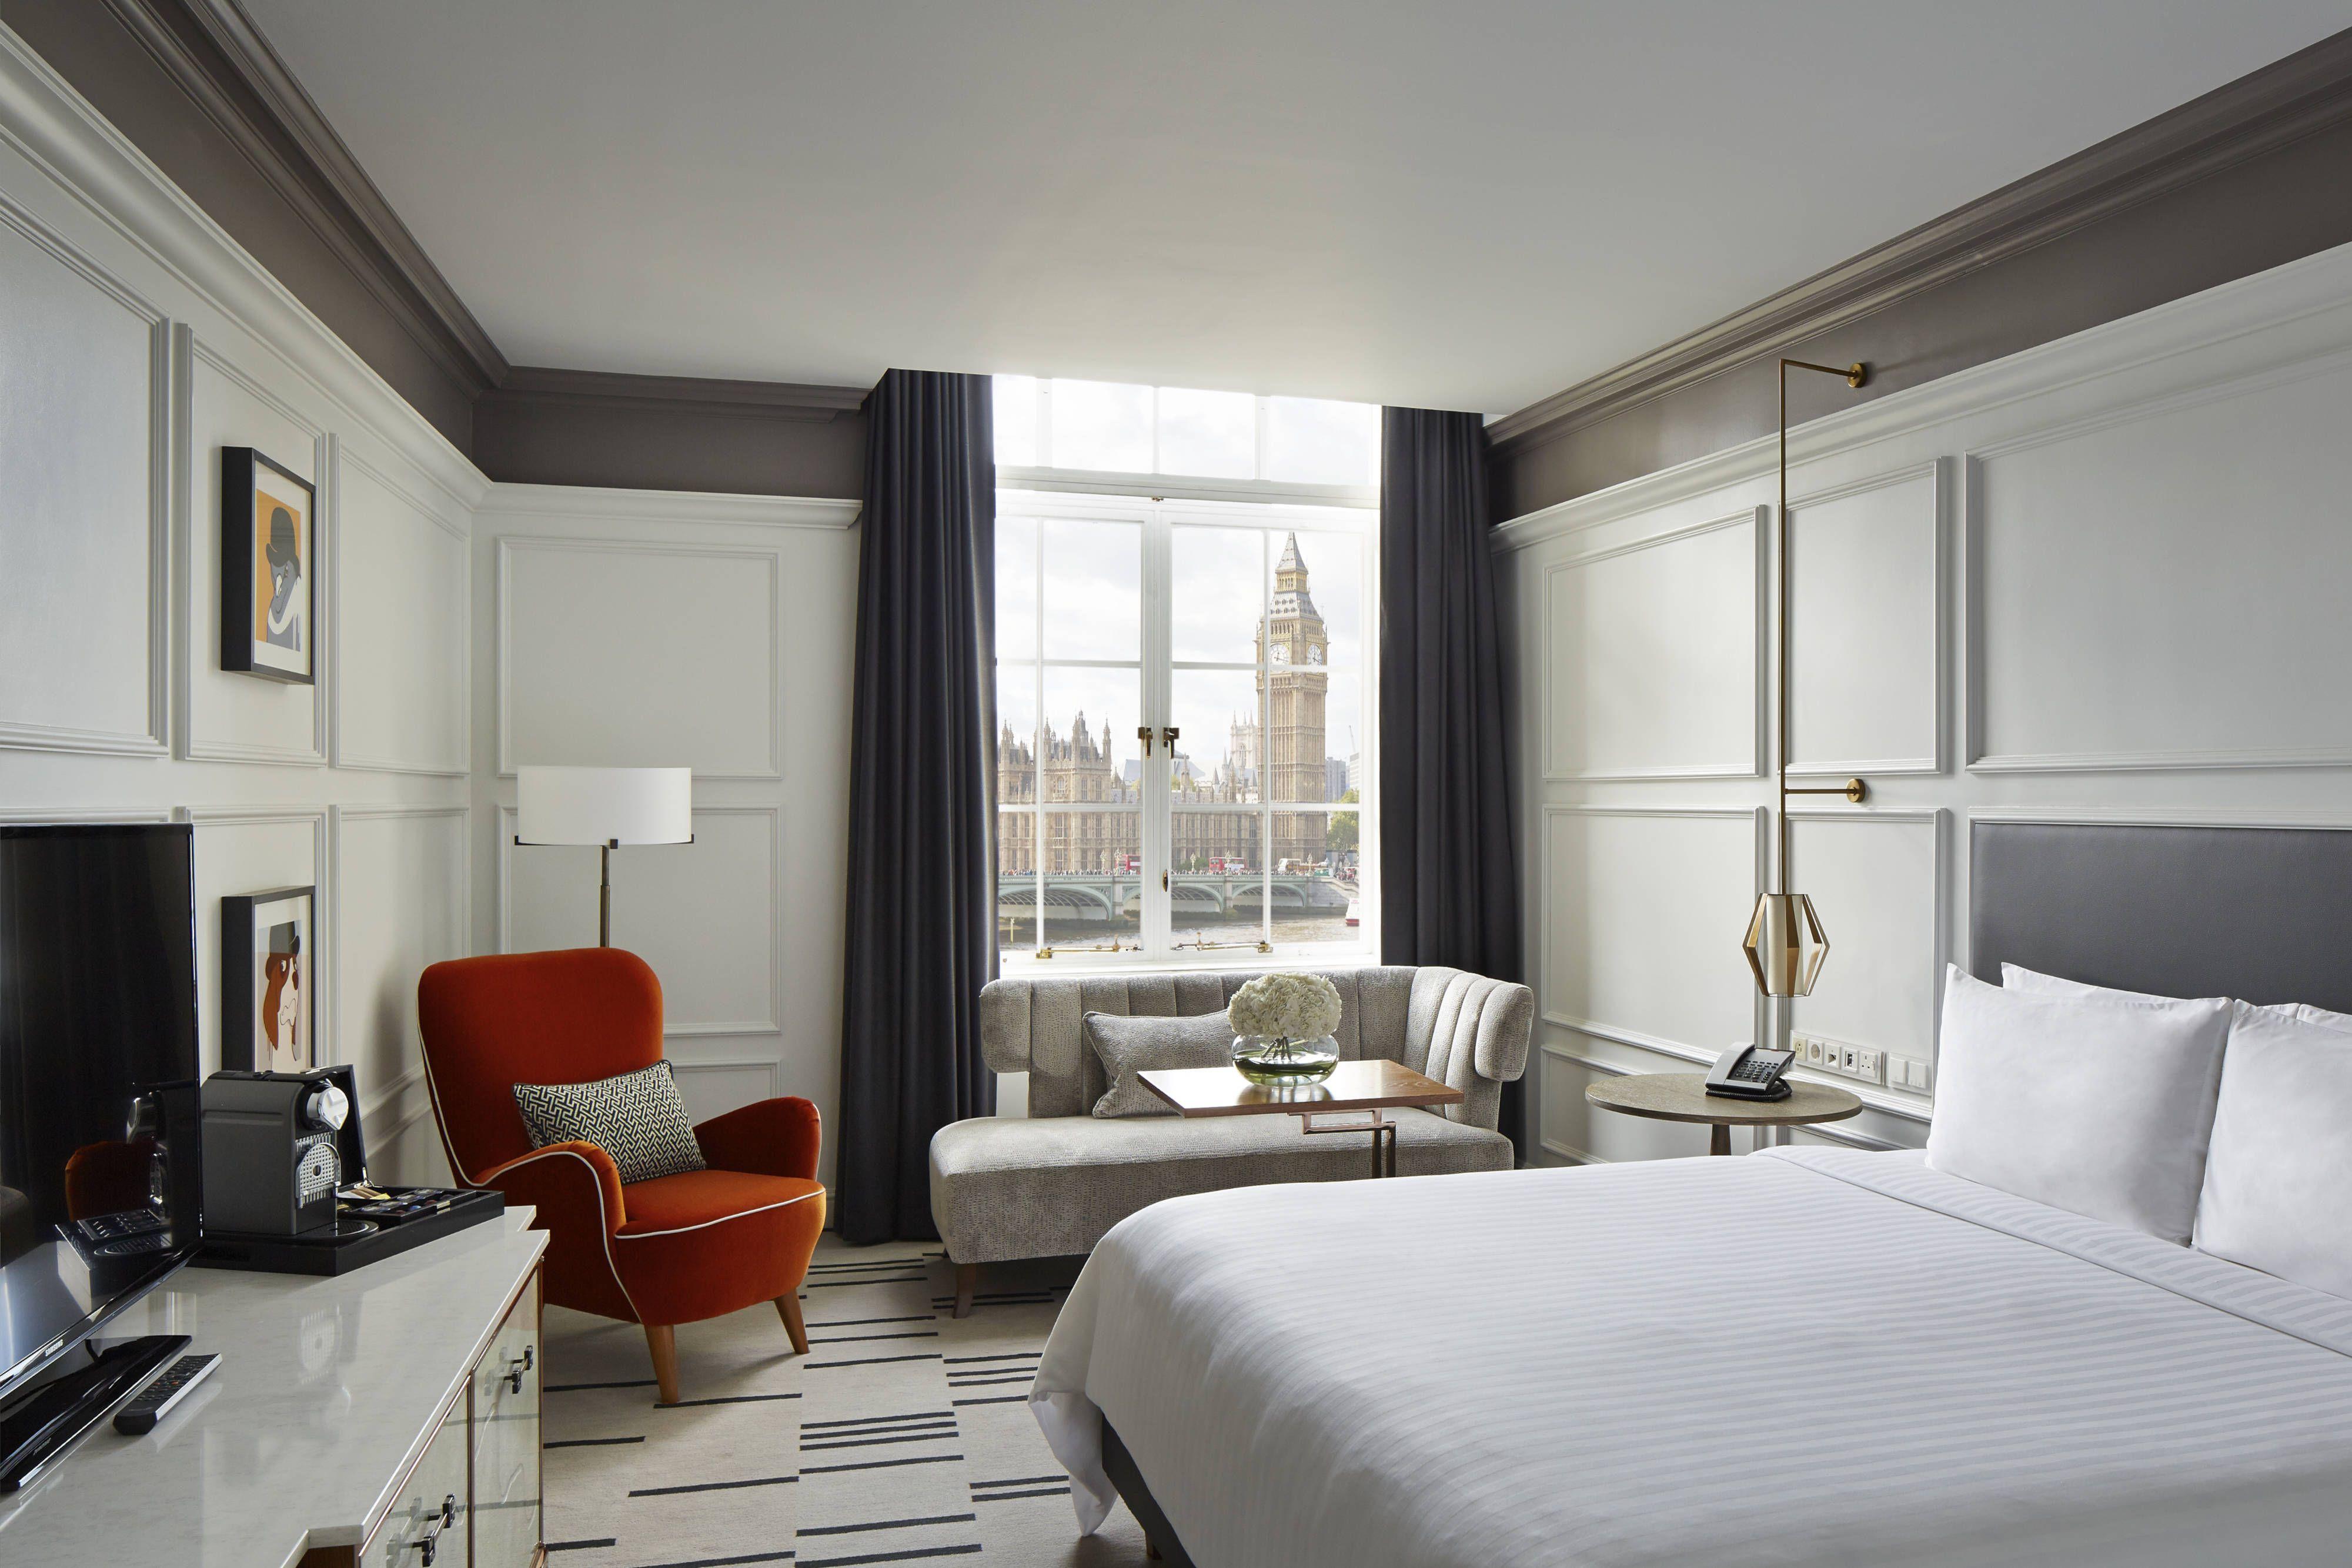 london marriott hotel county hall parliament view room relax rh pinterest com